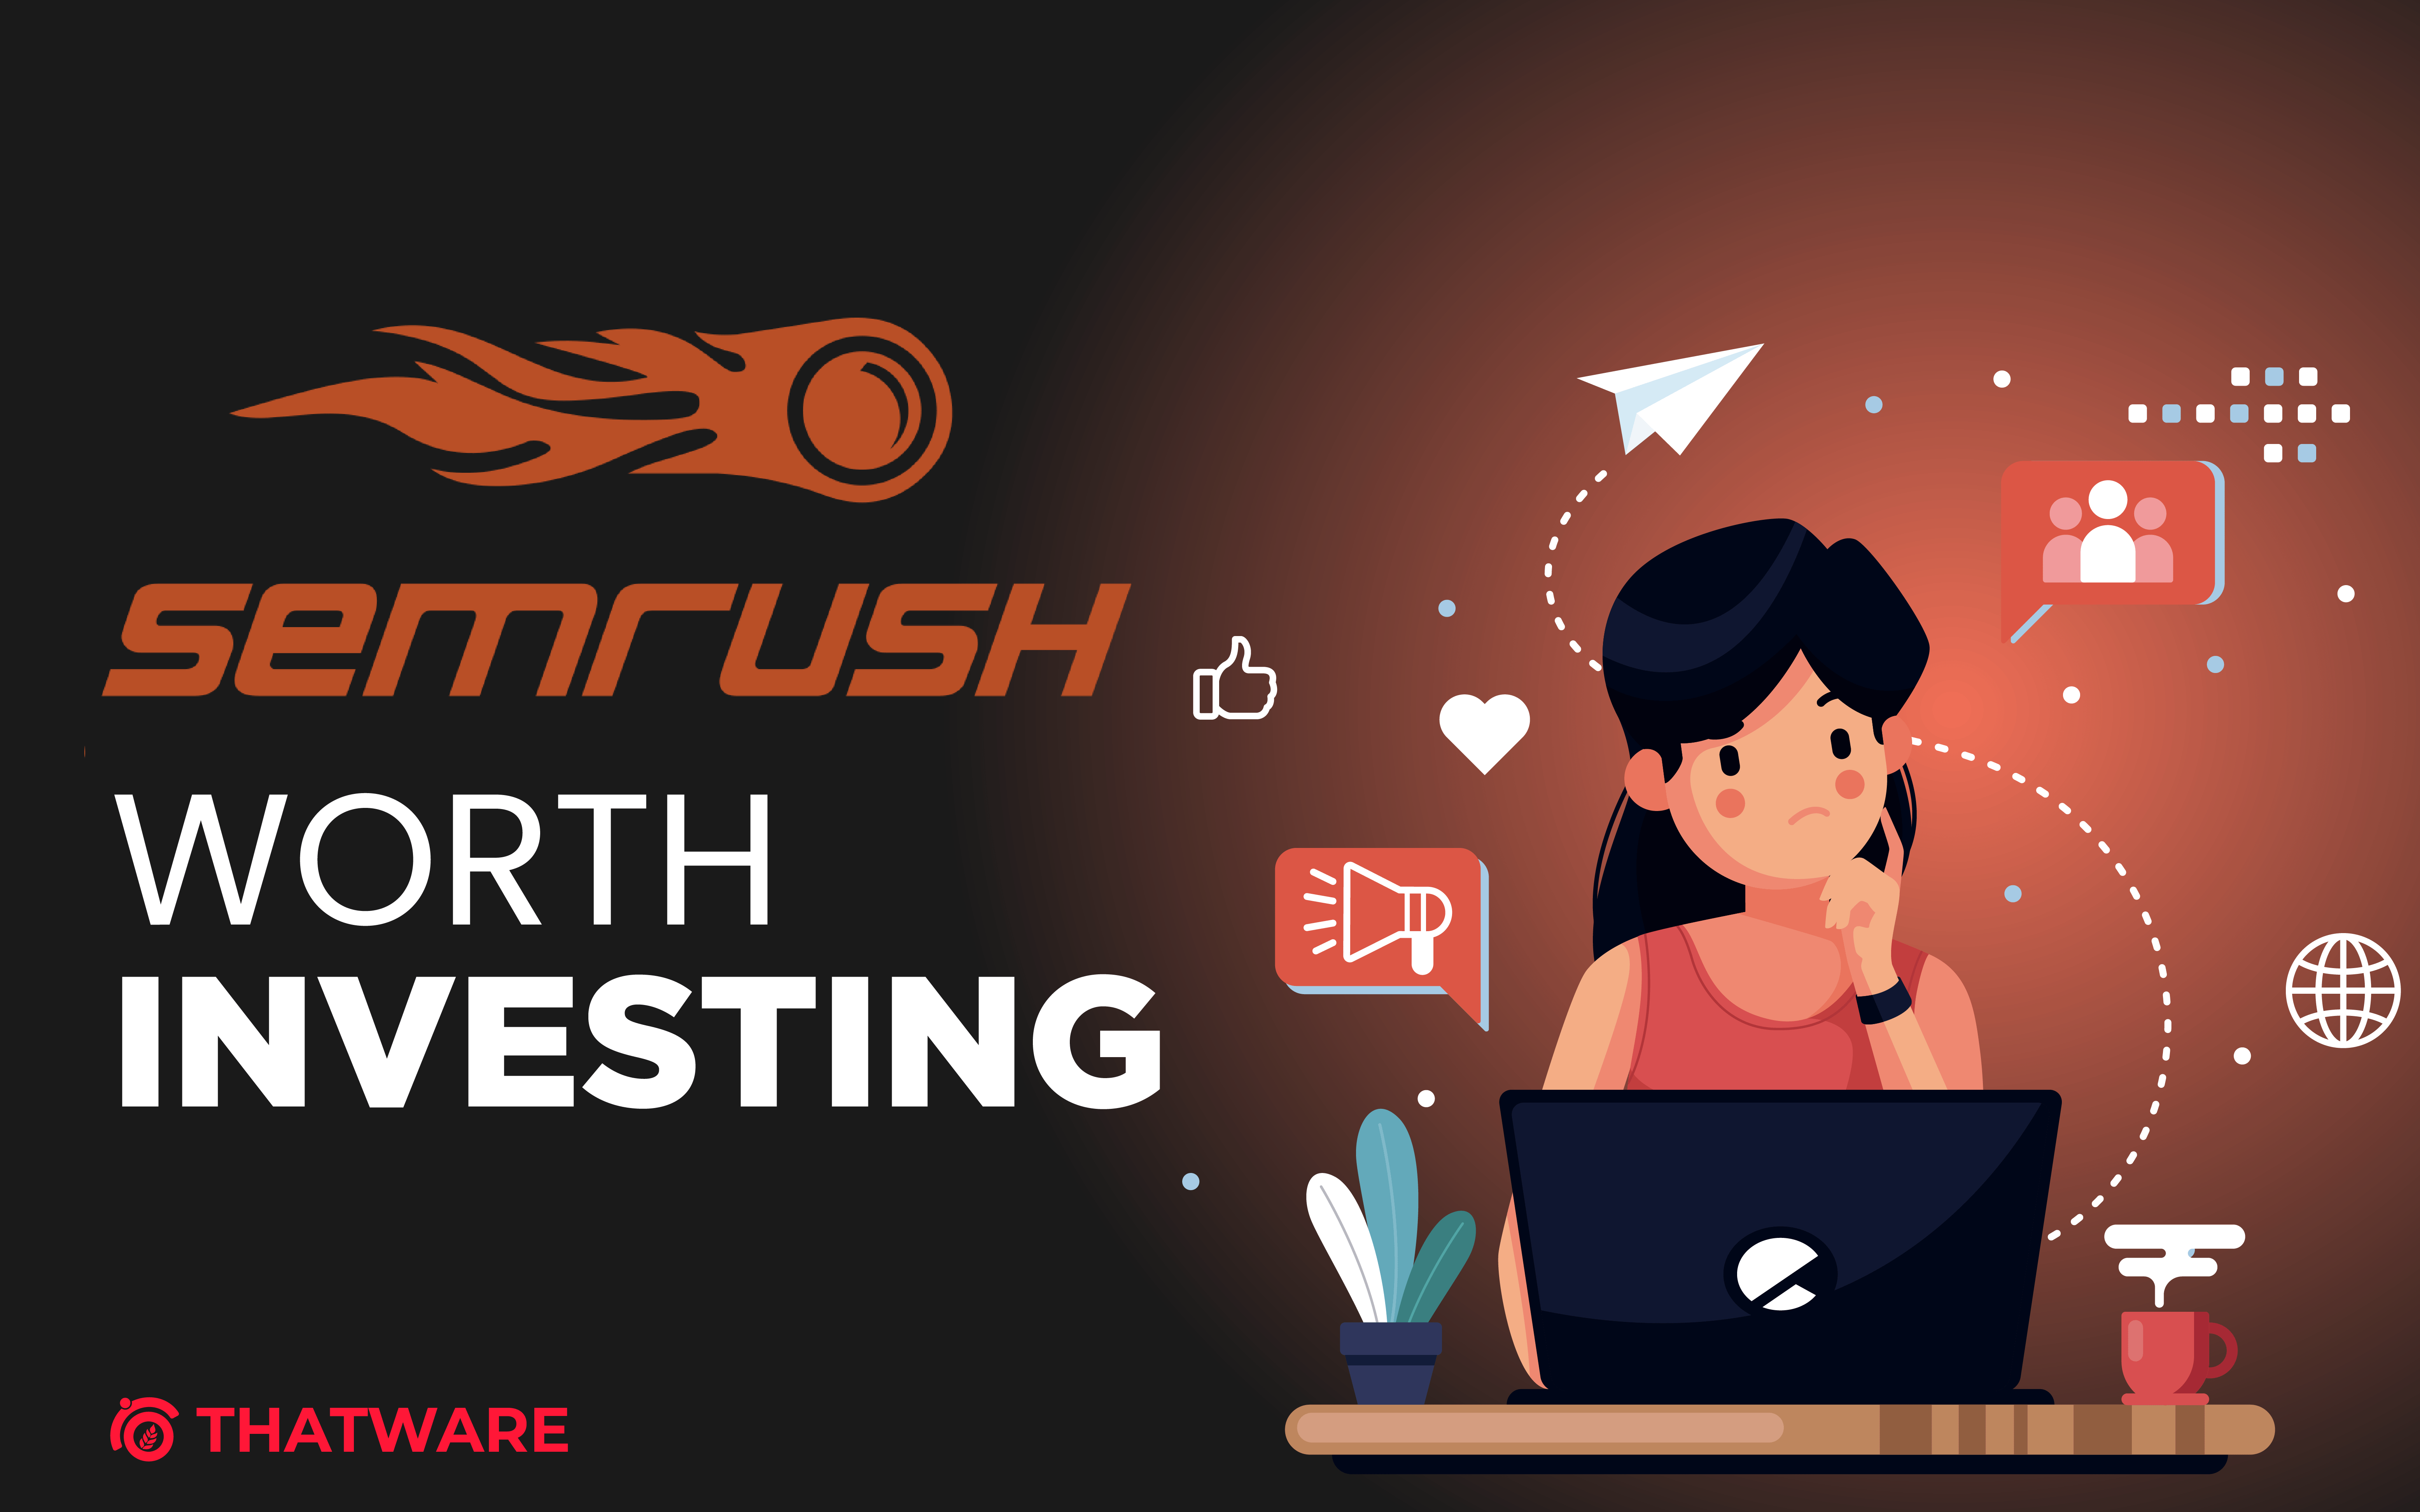 Is SEMRush worth Investing